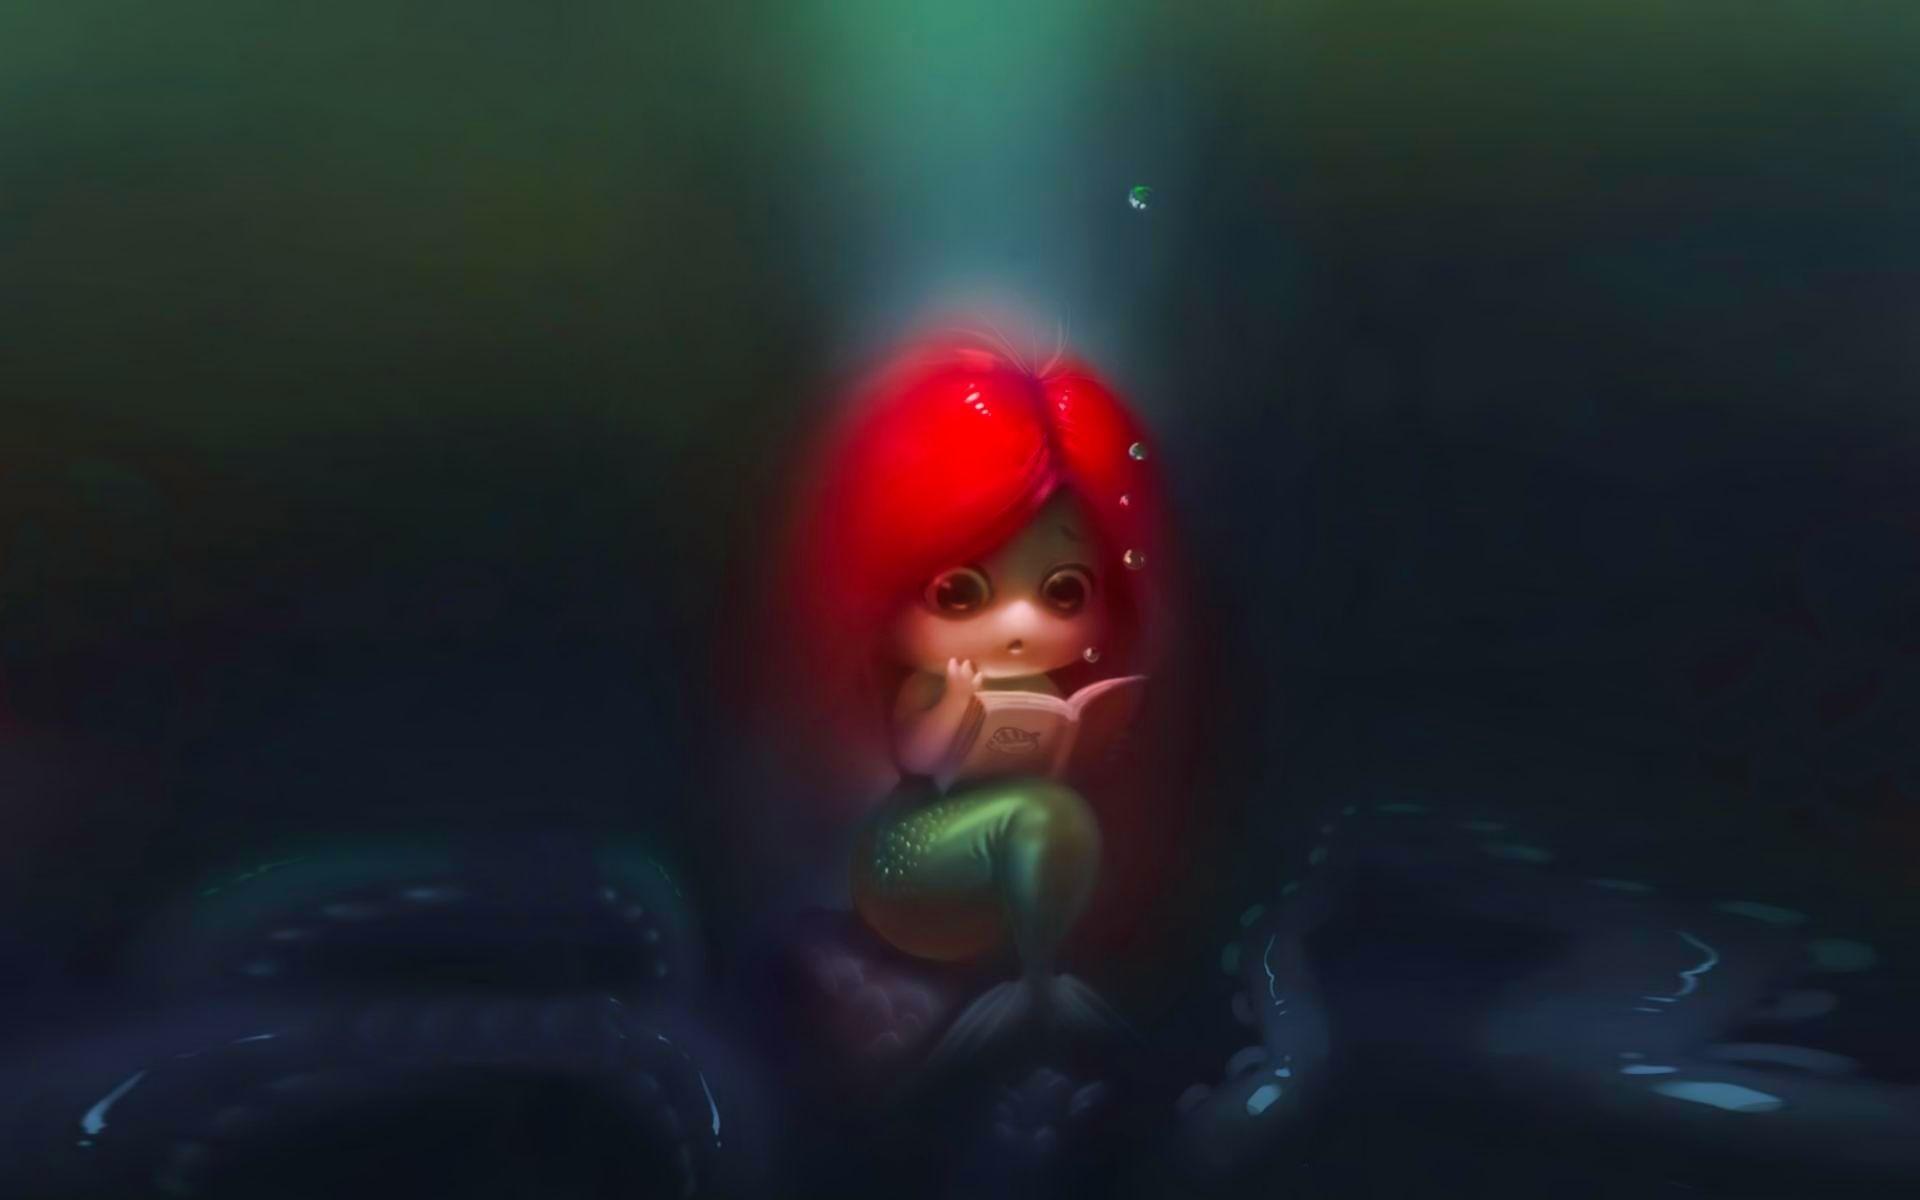 Mermaid Little Girl   Cute HD 4k Wallpapers